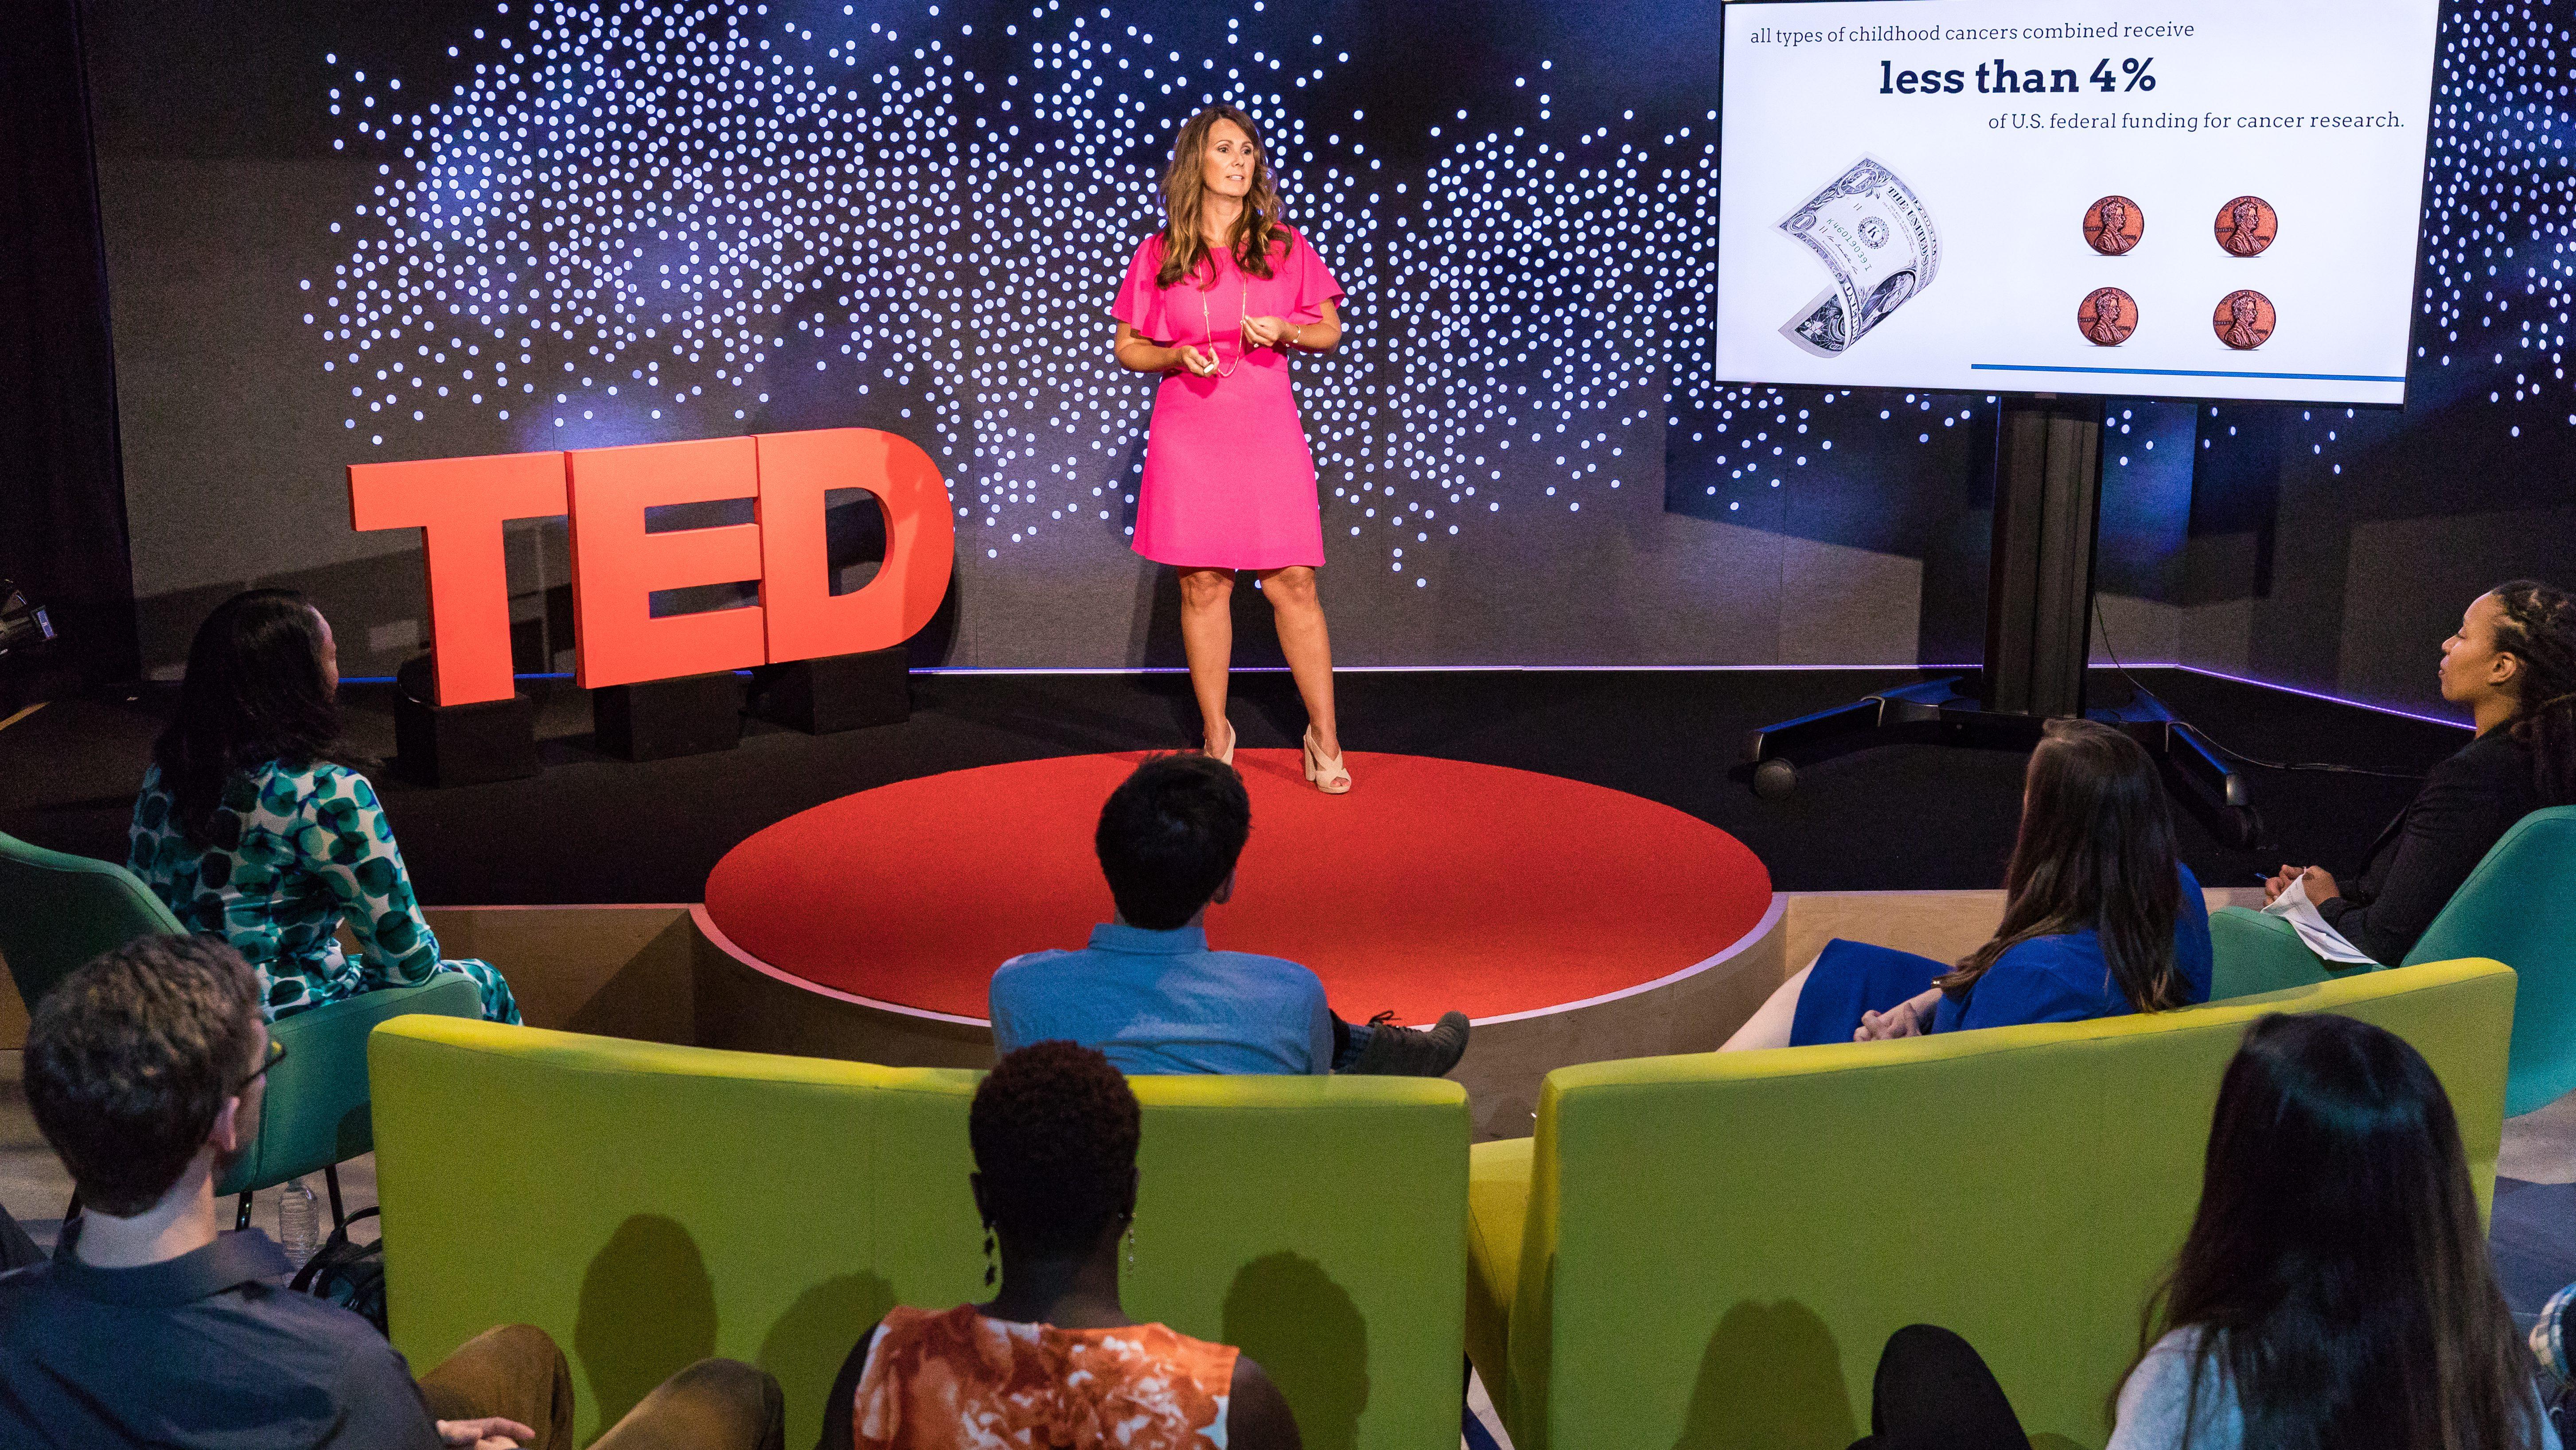 Amber Bender speaks at TEDNYC - TED Institute Logitech Spotlight Academy, July 17, 2017, New York, NY. Photo: Ryan Lash / TED